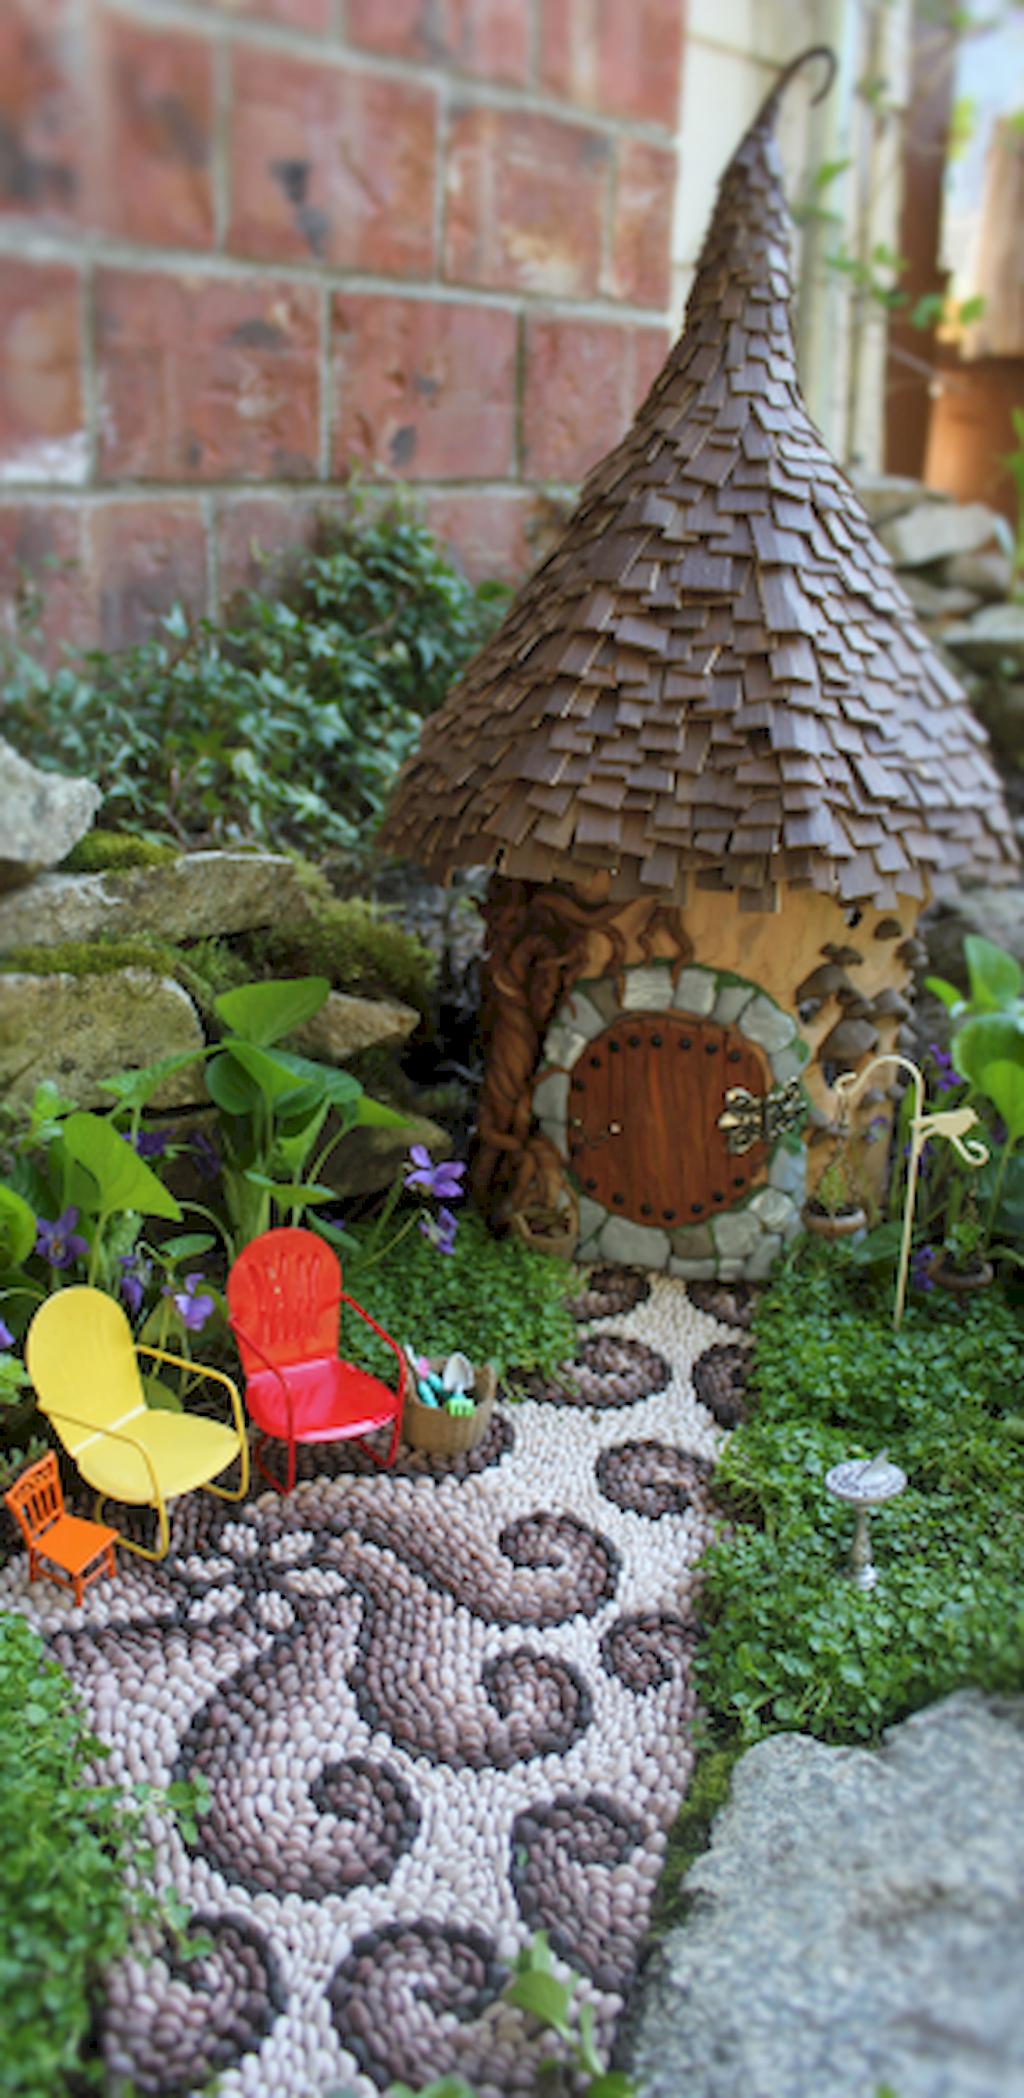 120 Amazing Backyard Fairy Garden Ideas On A Budget 84 Homeastern Com Fairy Garden Diy Fairy Fairy Garden Diy